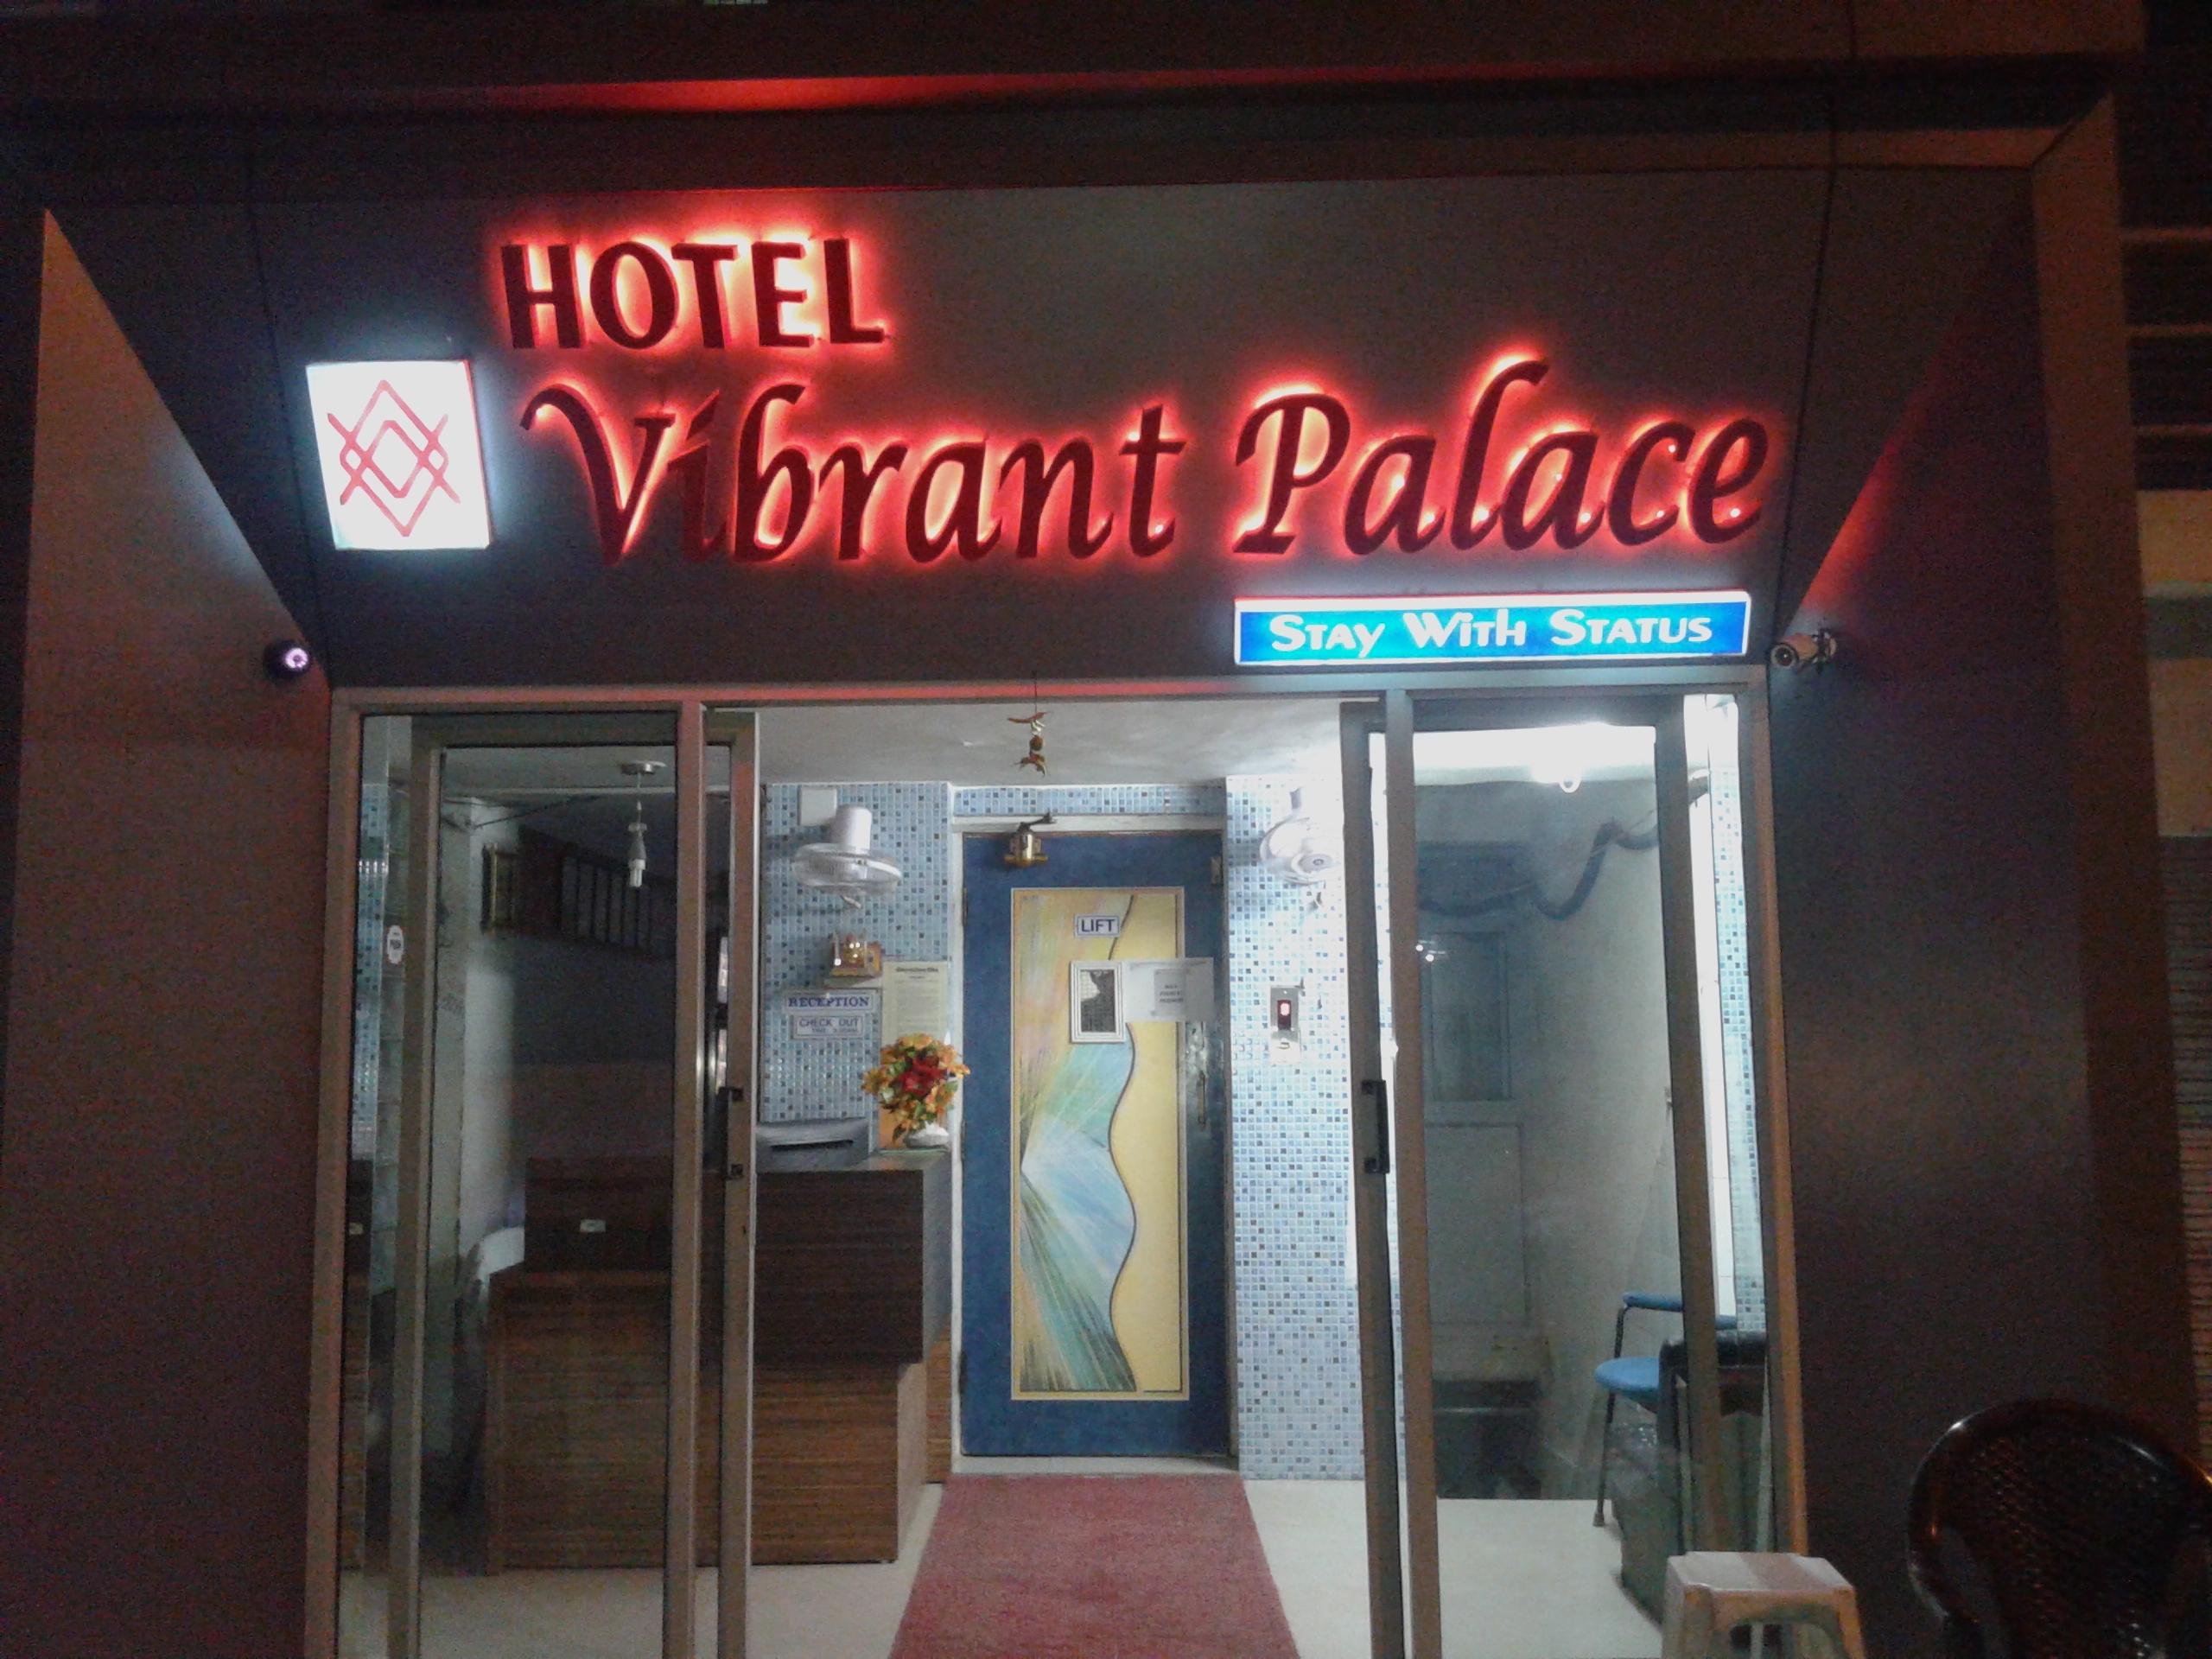 Hotel Vibrant Palace